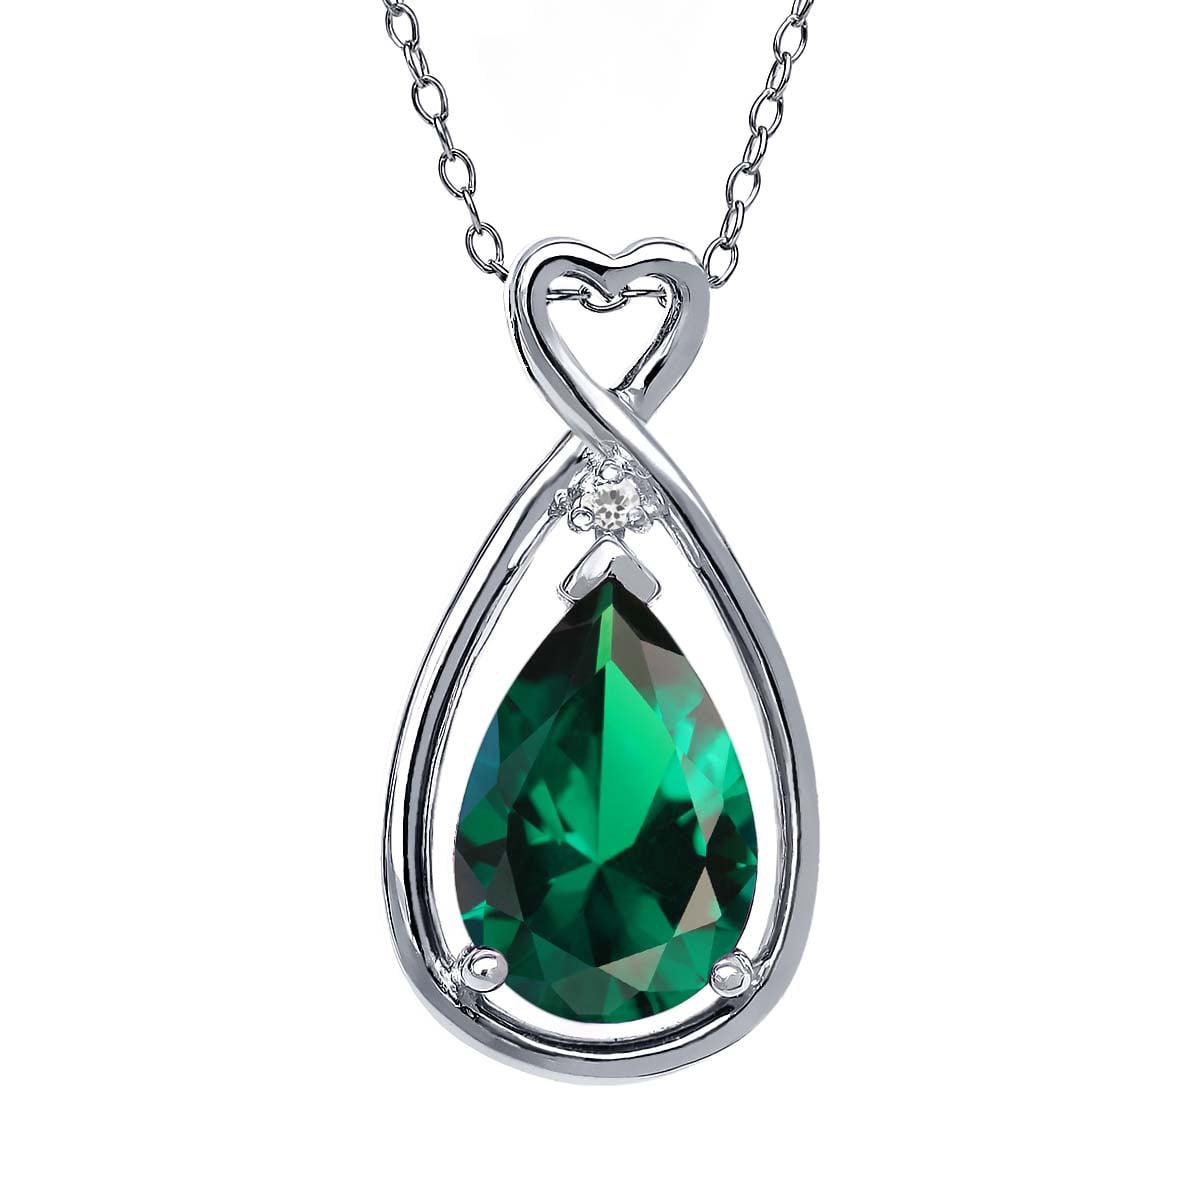 2.45 Ct Pear Shape Green Simulated Emerald White Sapphire 18K White Gold Pendant